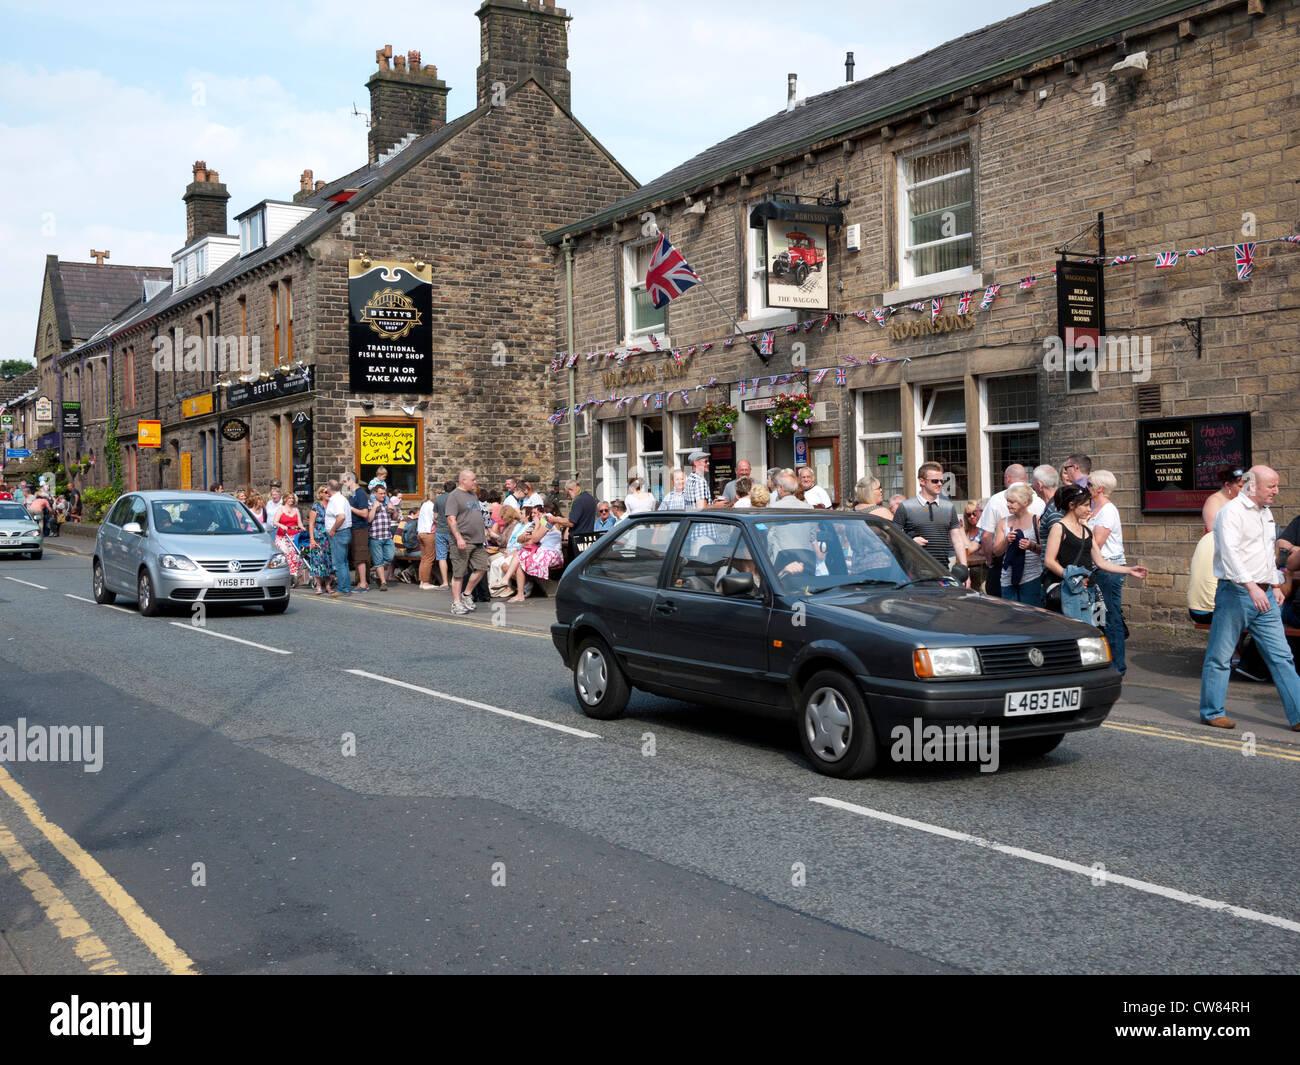 Uppermill Pub scene, Uppermill, Saddleworth, Greater Manchester, England, UK. - Stock Image